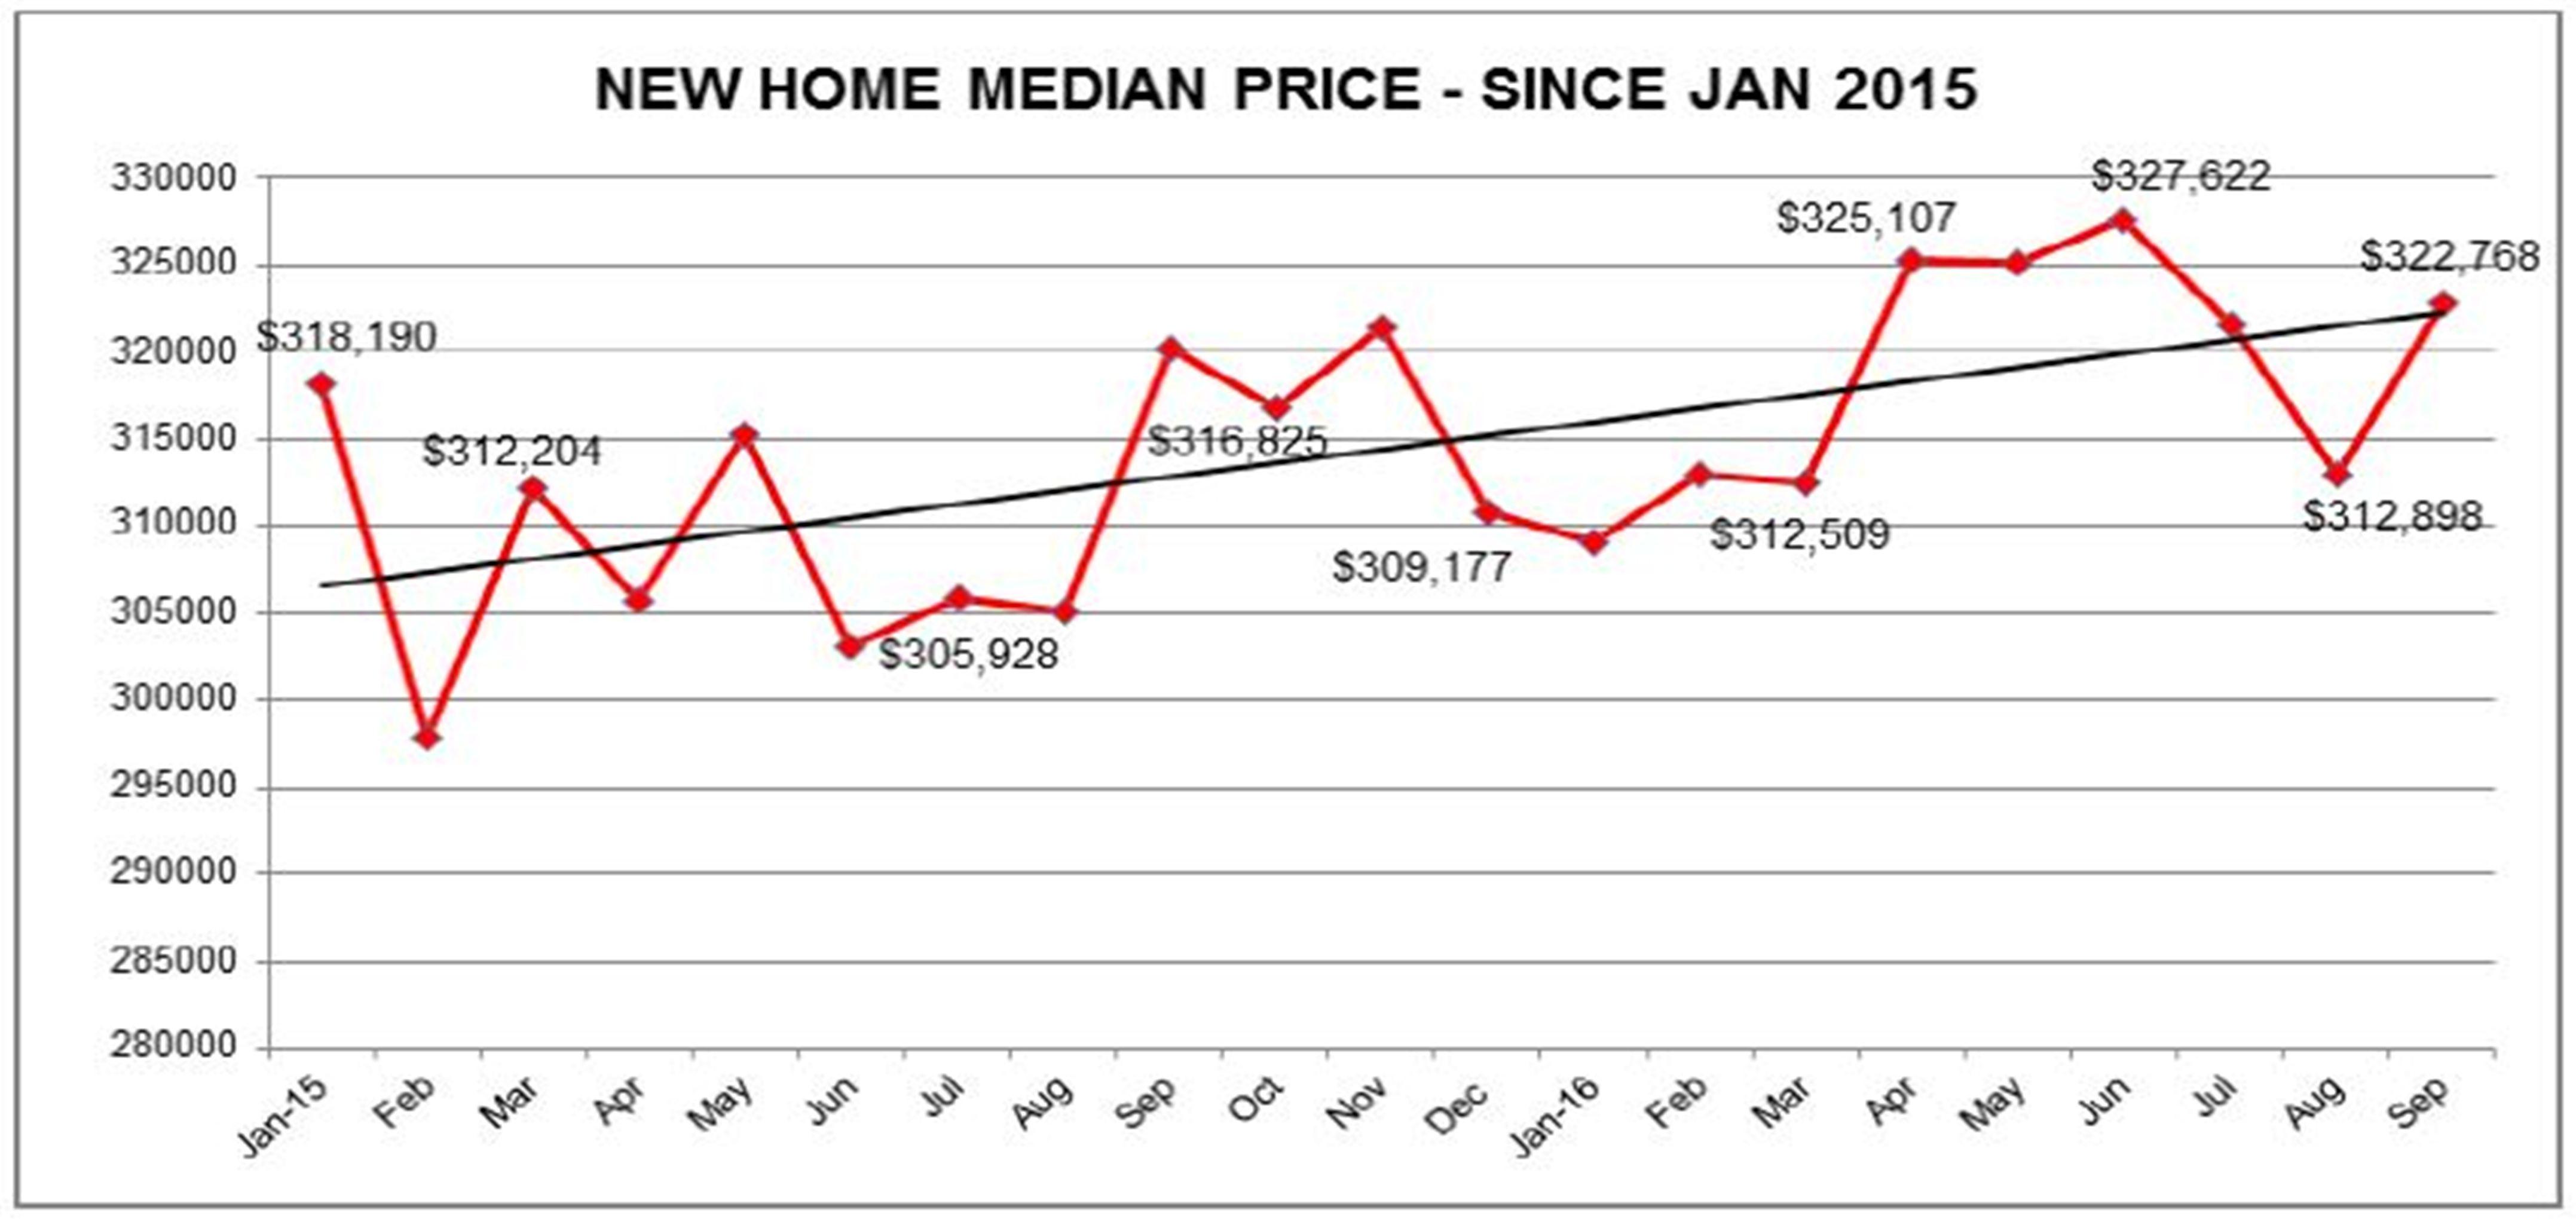 2016 NEW HOMES STATS LAS VEGAS